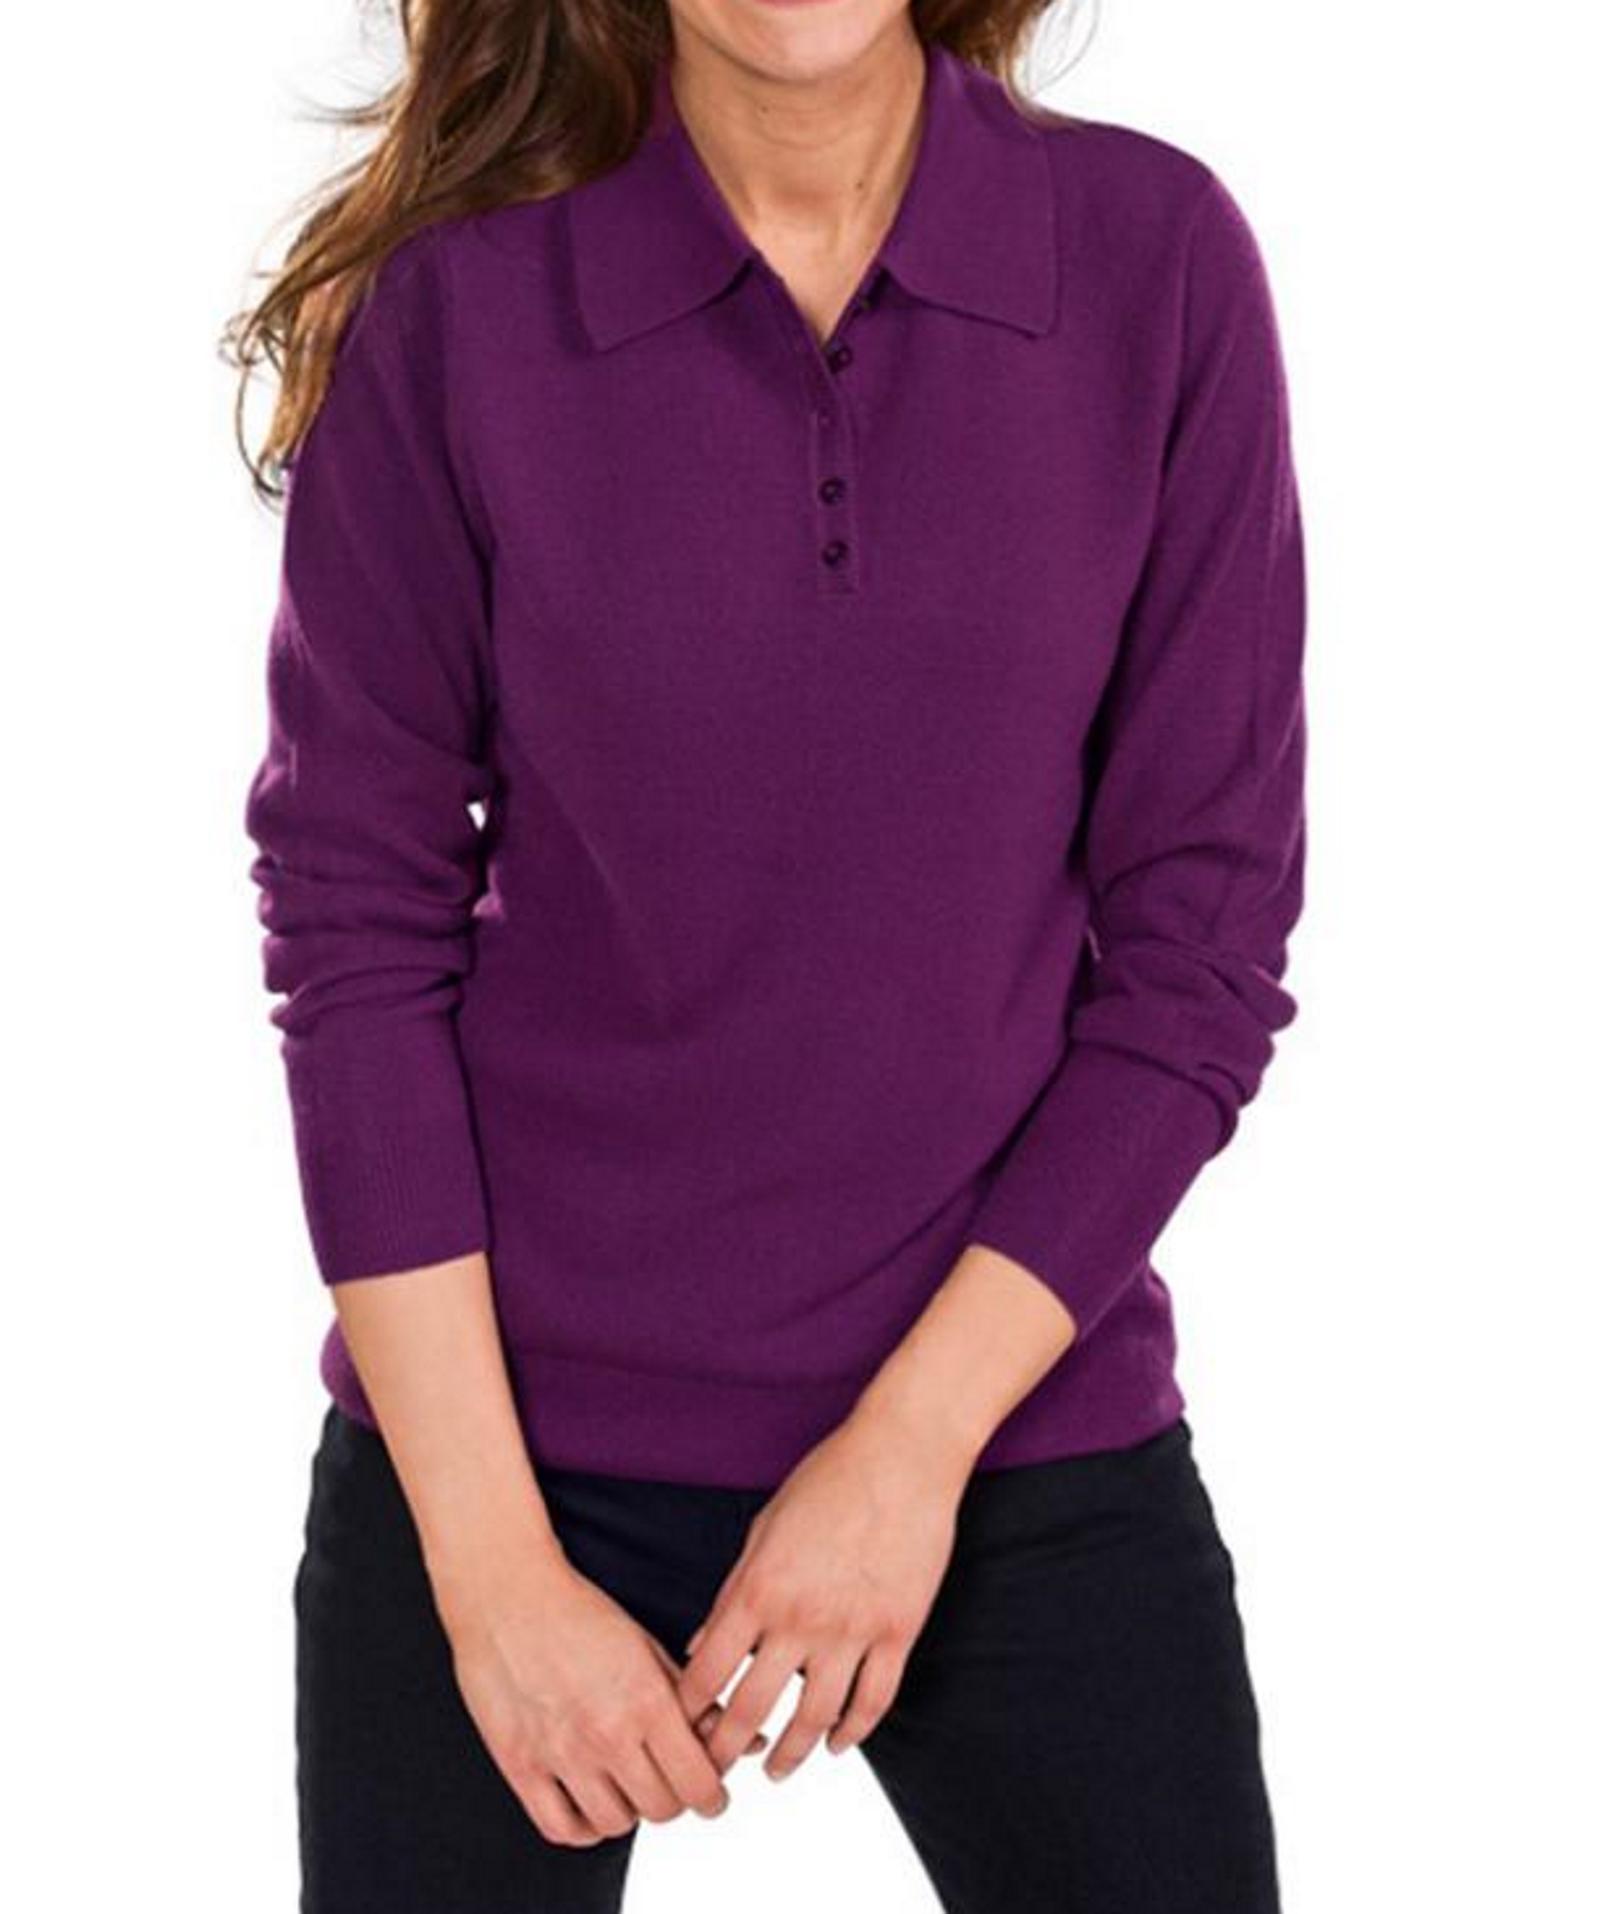 damen langarm poloshirt polo shirt pullover strick weinrot blau t rkis 38 40 46 ebay. Black Bedroom Furniture Sets. Home Design Ideas